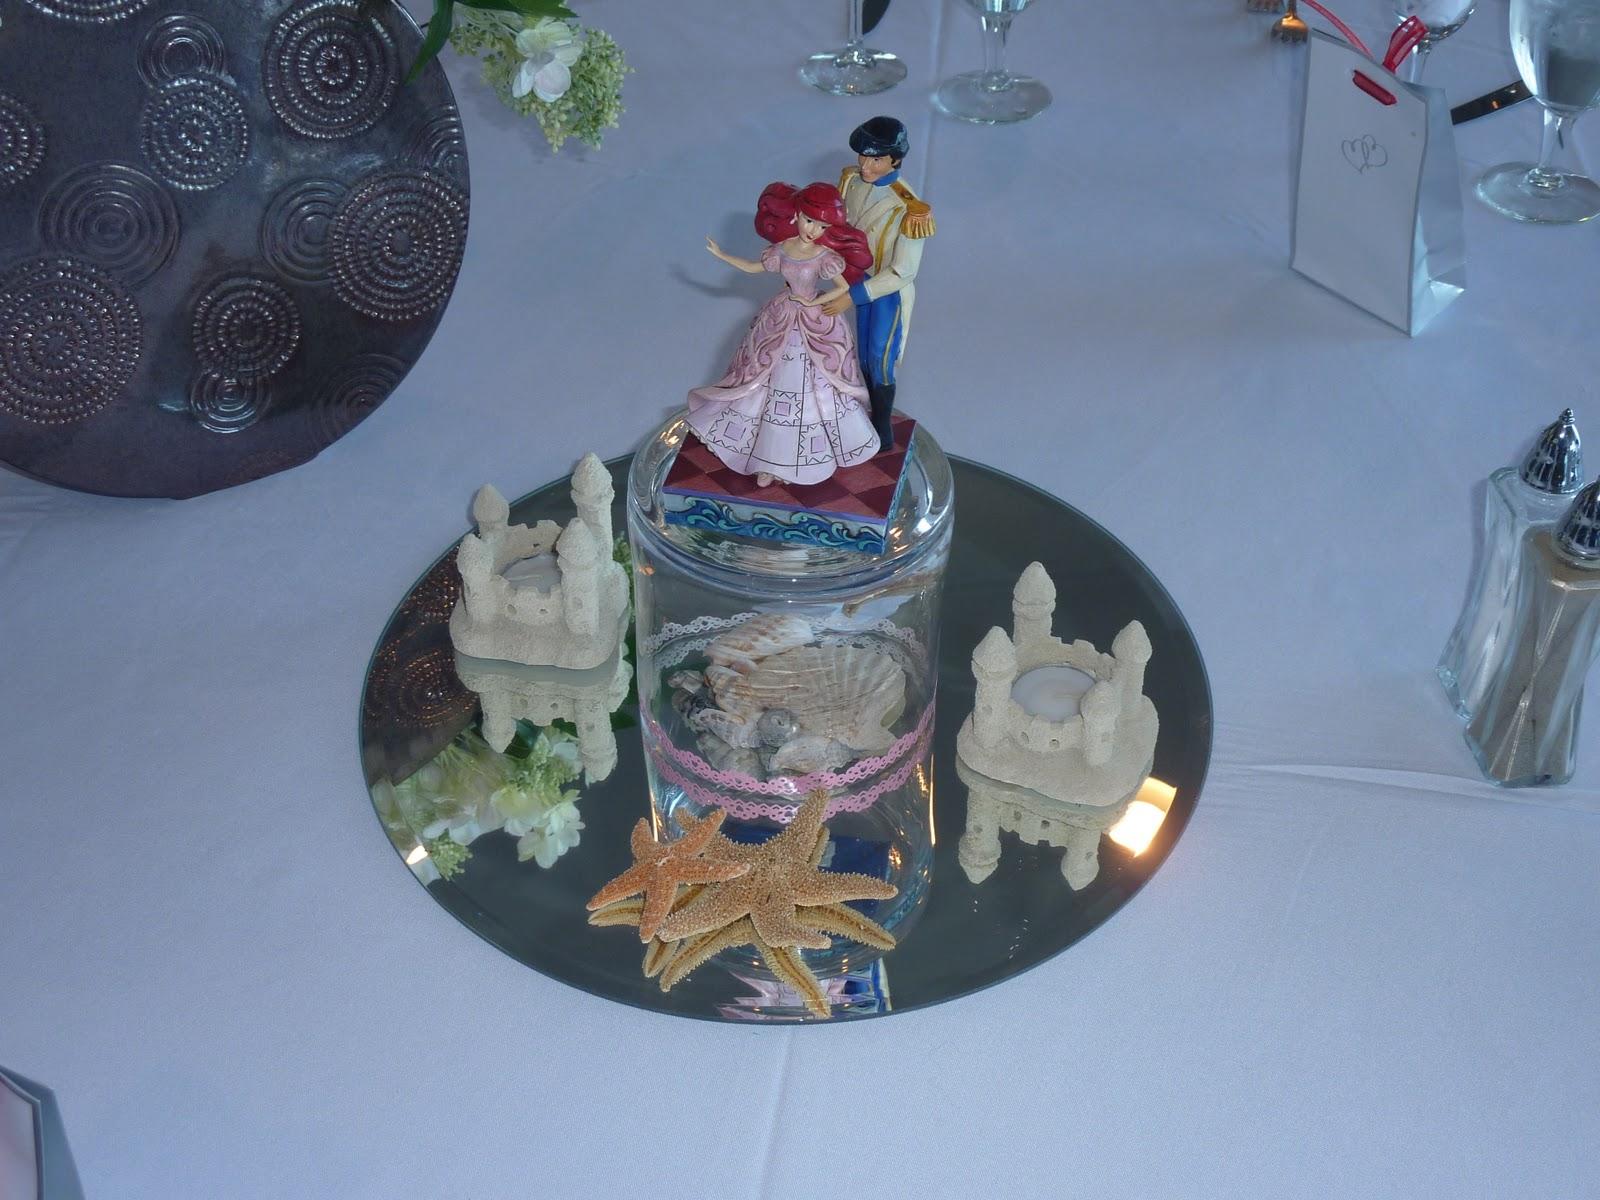 disney with sorcerer tink disney wedding reception decorations